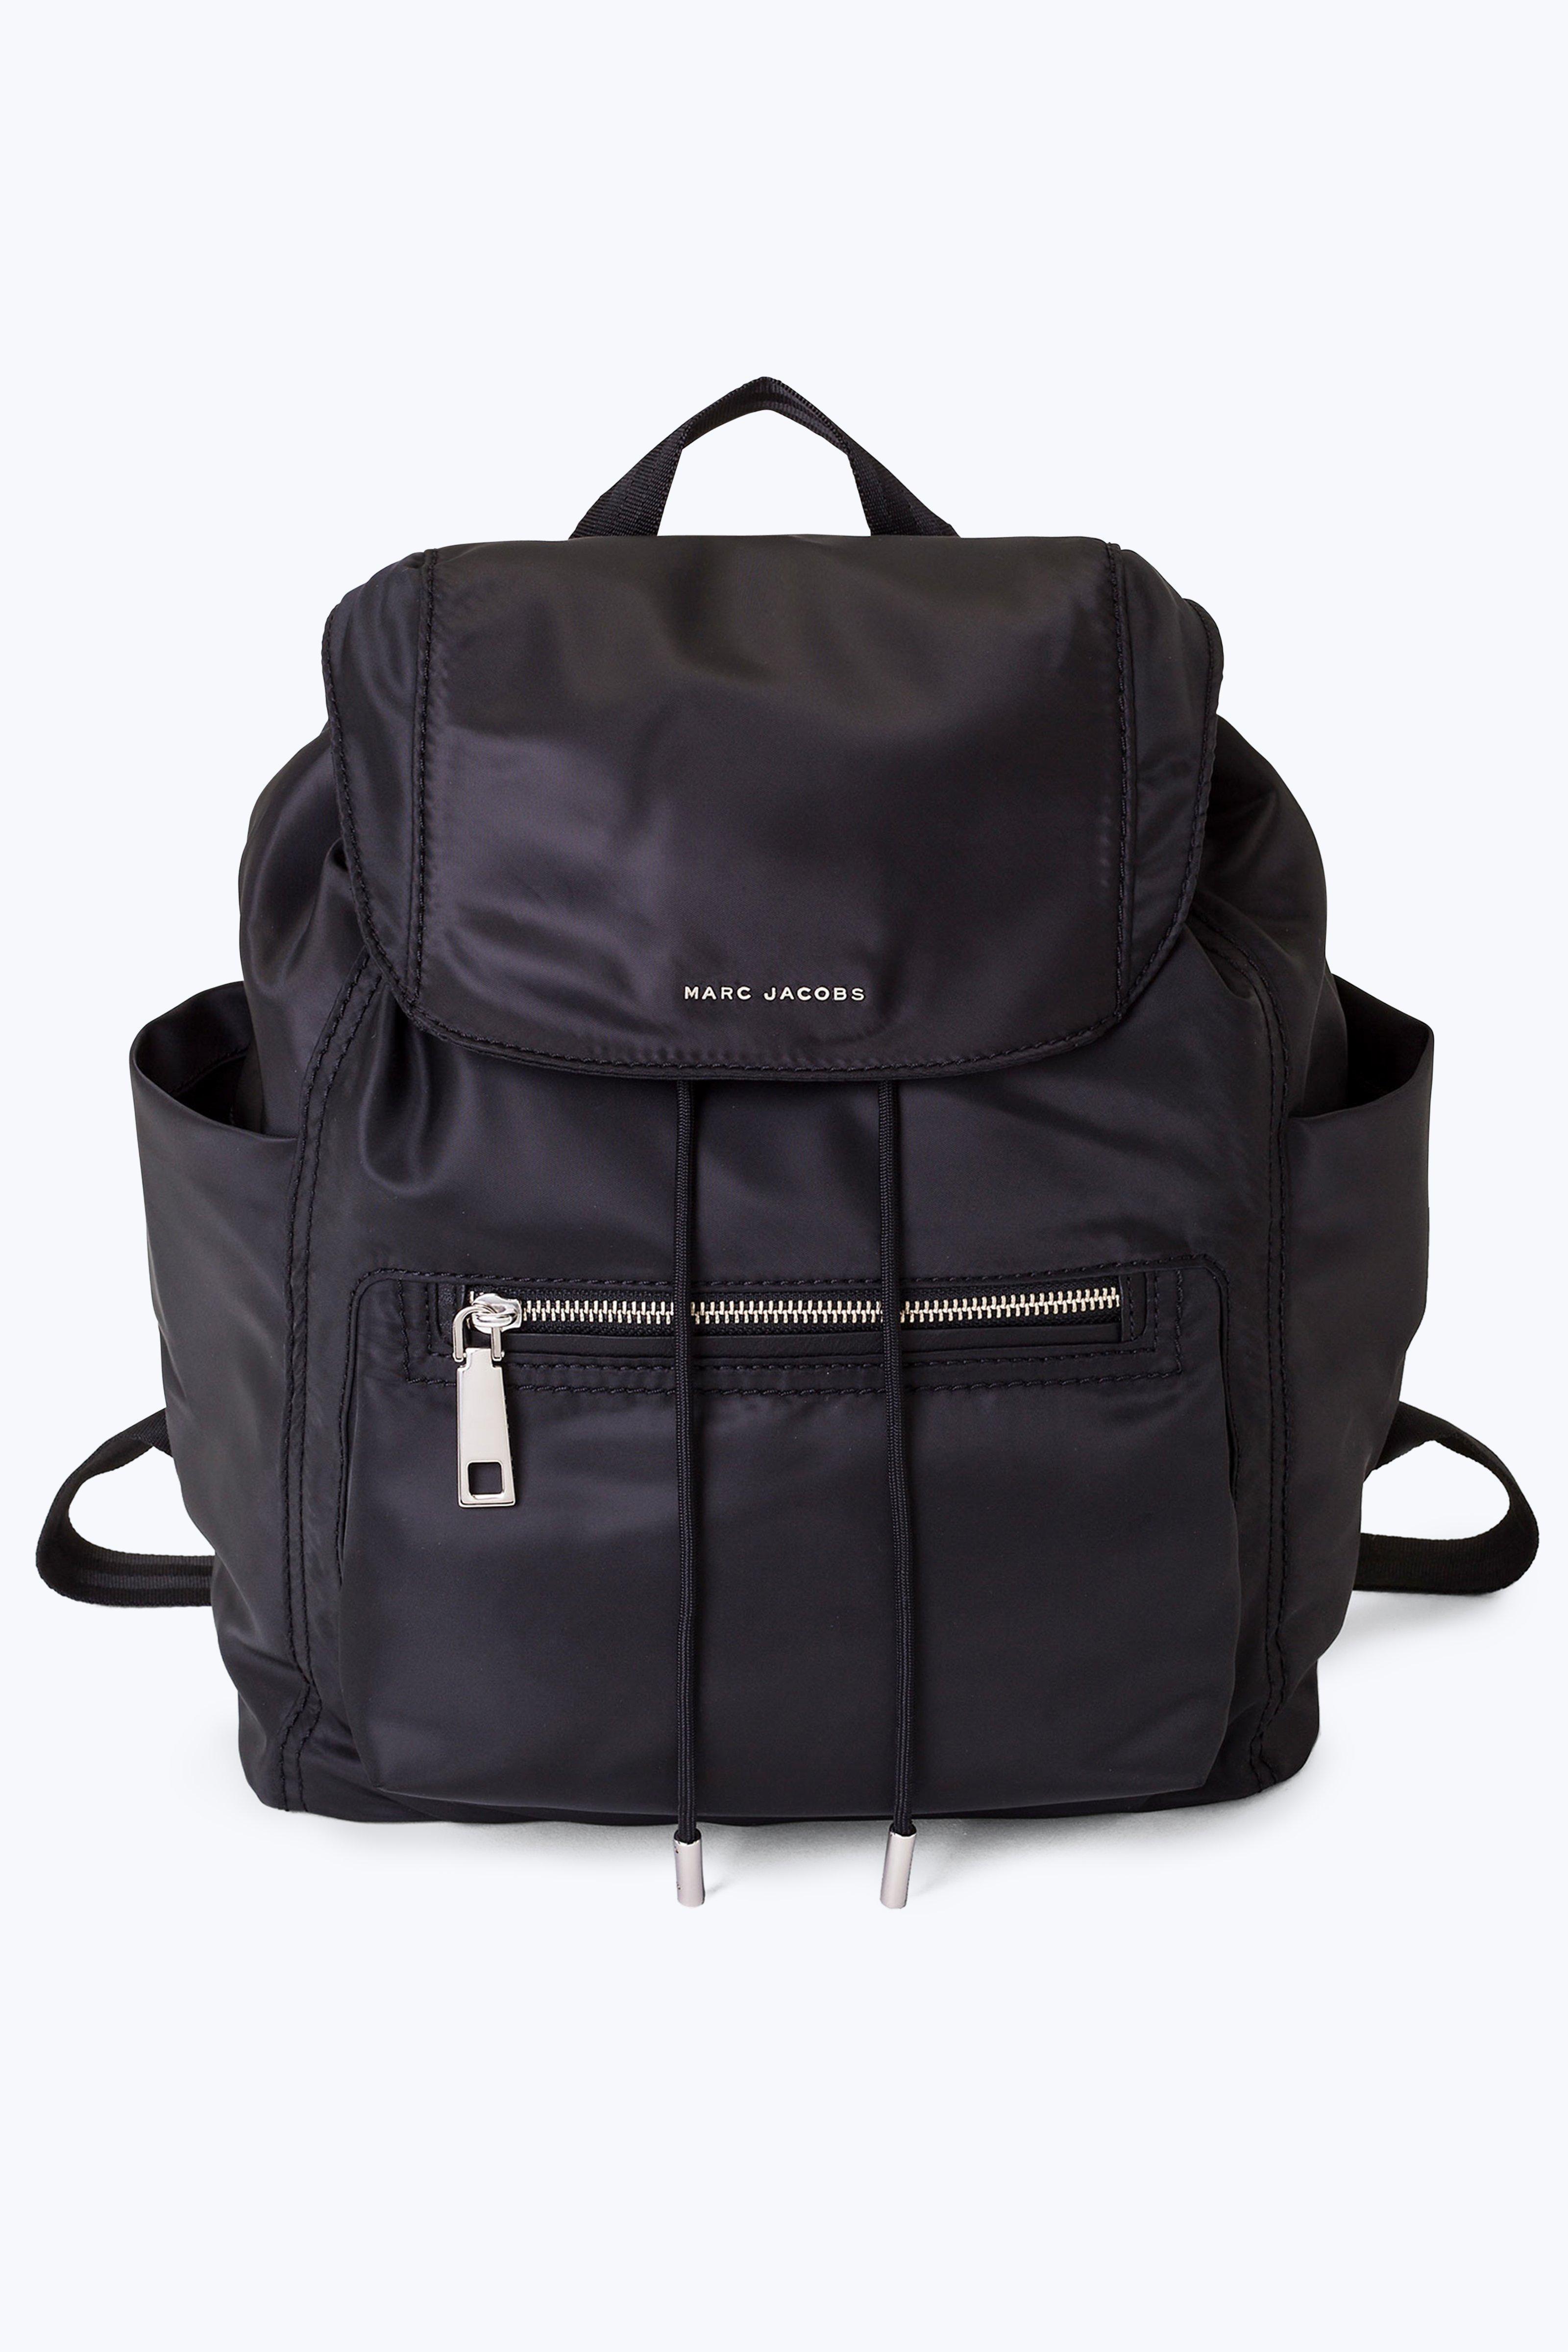 Marc Jacobs Easy Backpack In Black